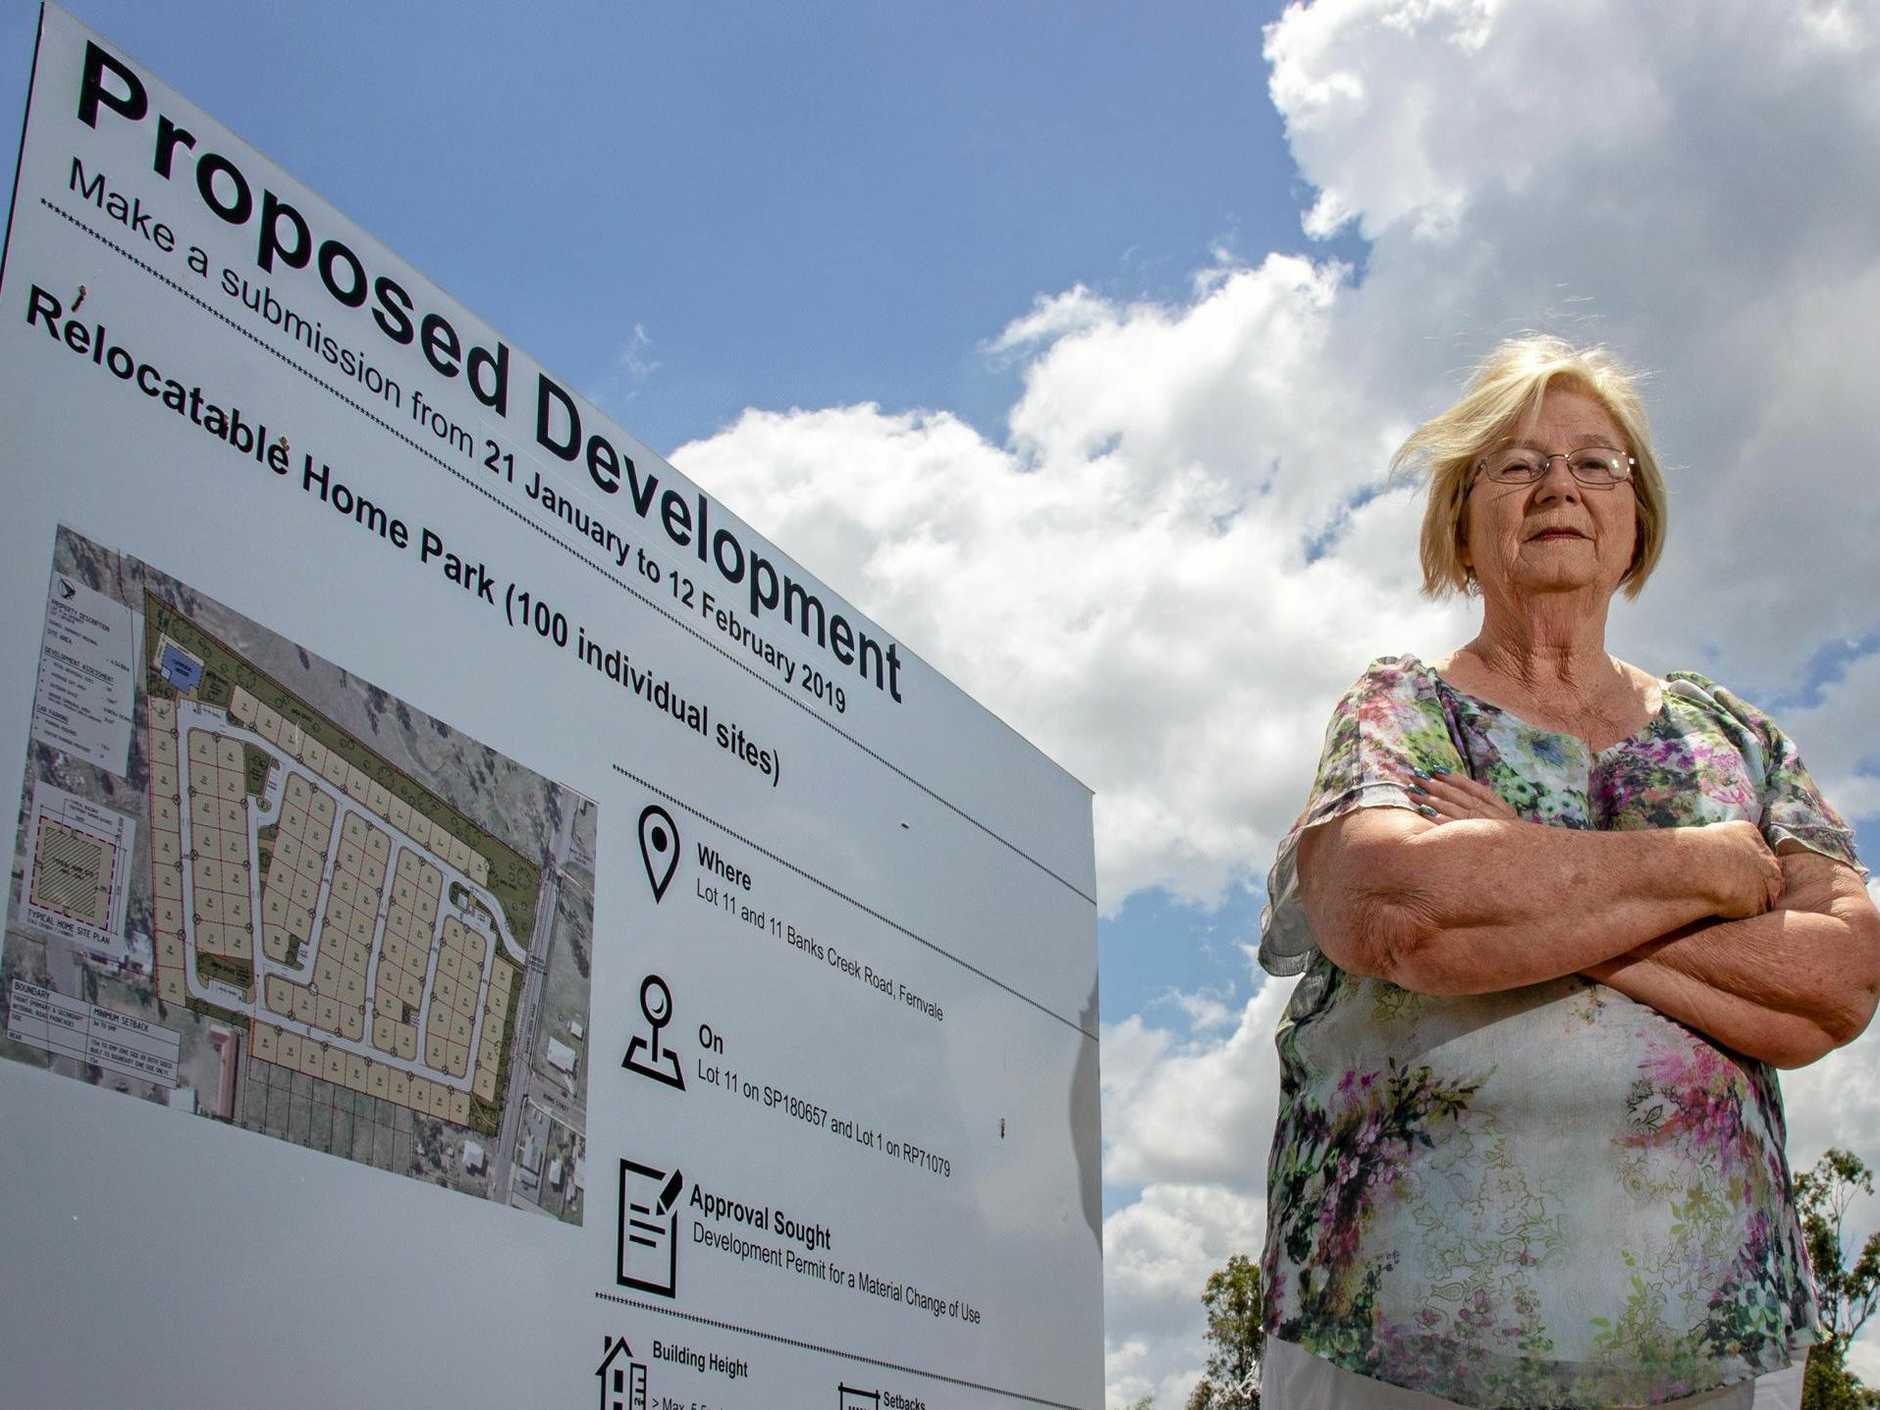 NOT HERE: Fernvale Community Association Inc. president Julia Caunce said Roubaix Properties' proposed developement wasn't appropriate for the Fernvale region.